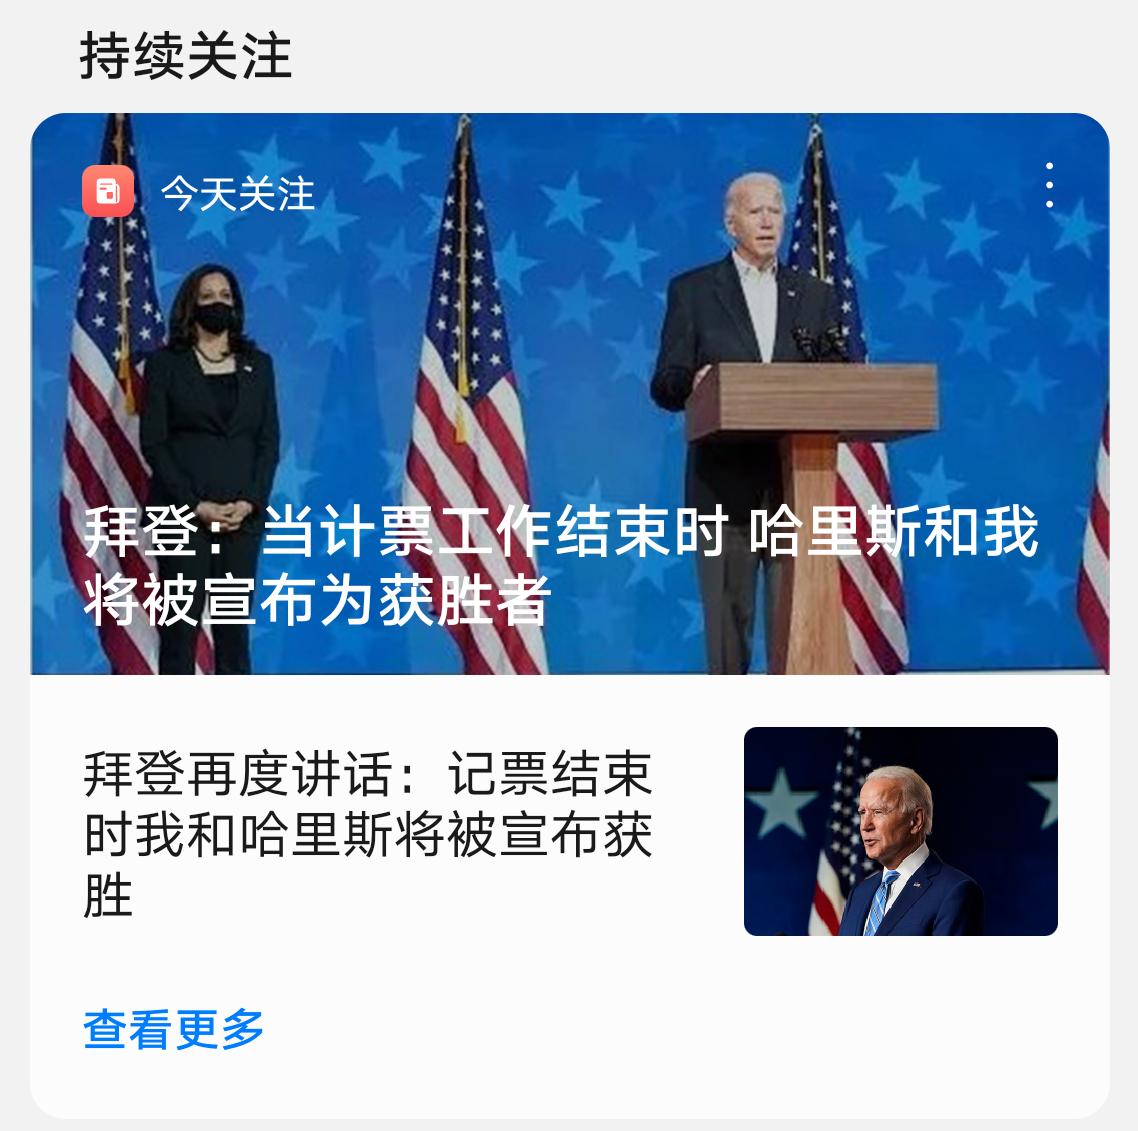 Screenshot_20201106_091213_com.huawei.intelligent.png